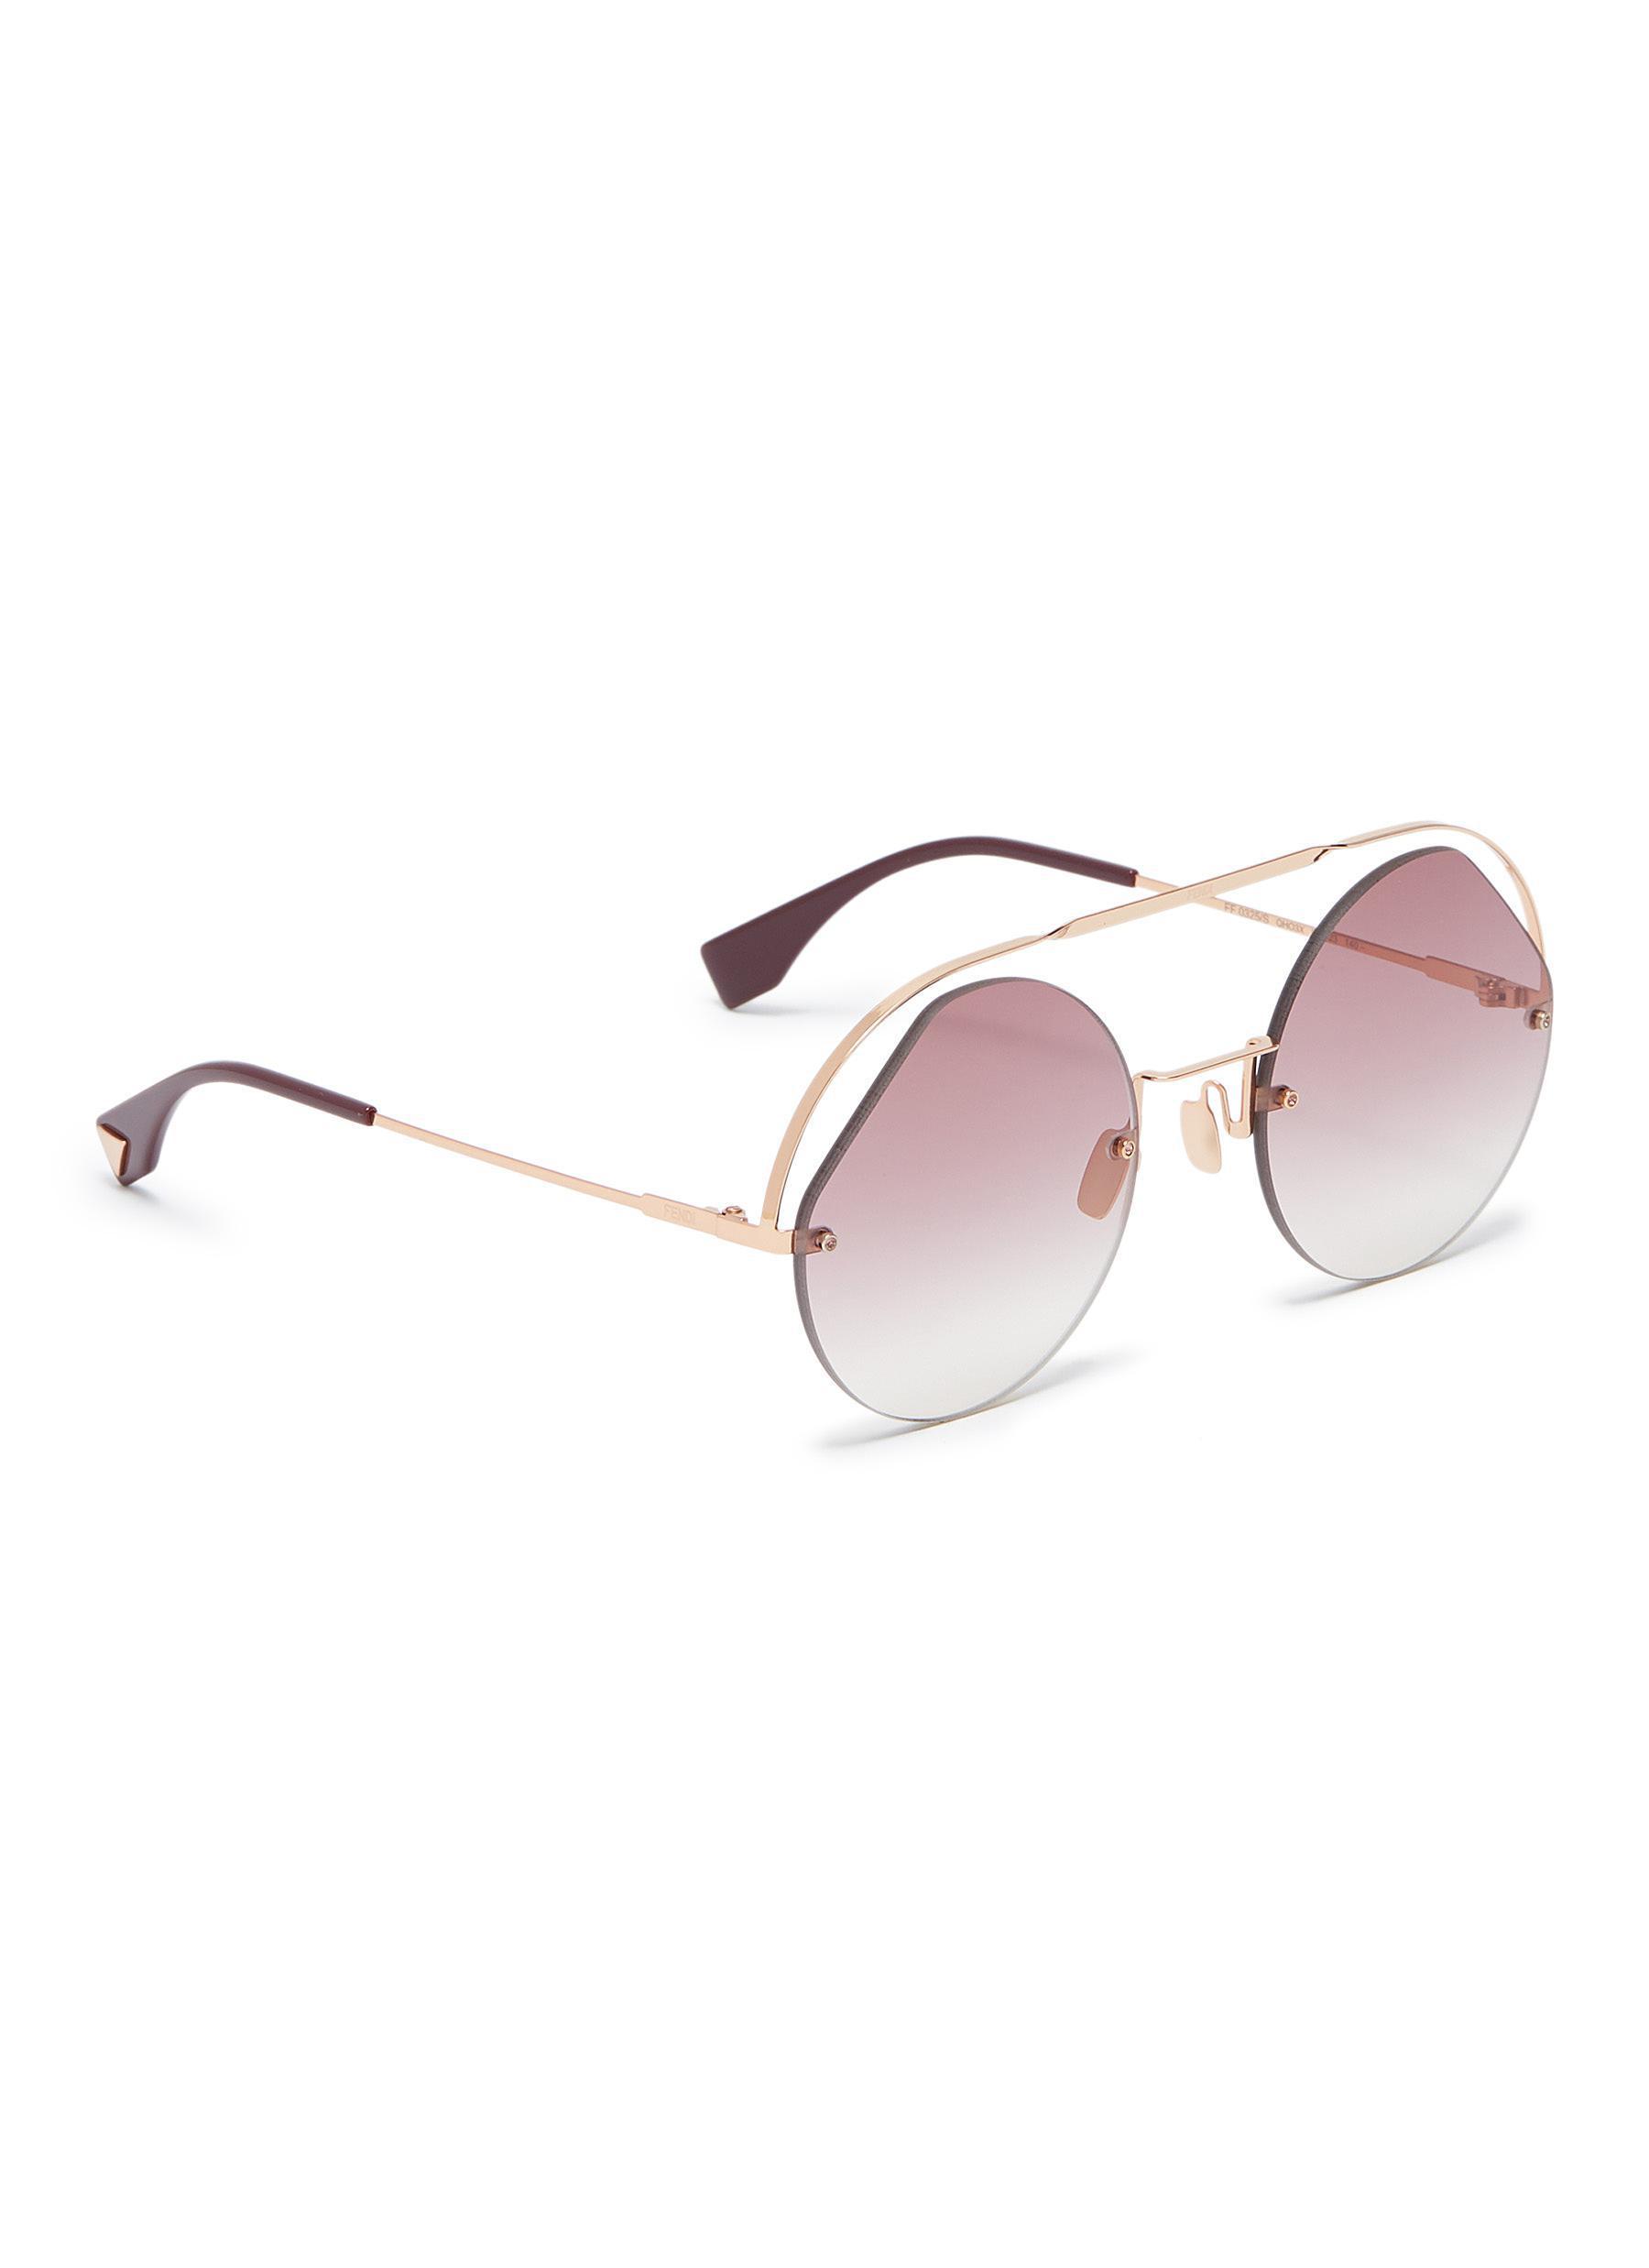 de3f97b181 Fendi - Metallic Metal Browbar Rimless Angular Aviator Sunglasses - Lyst.  View fullscreen